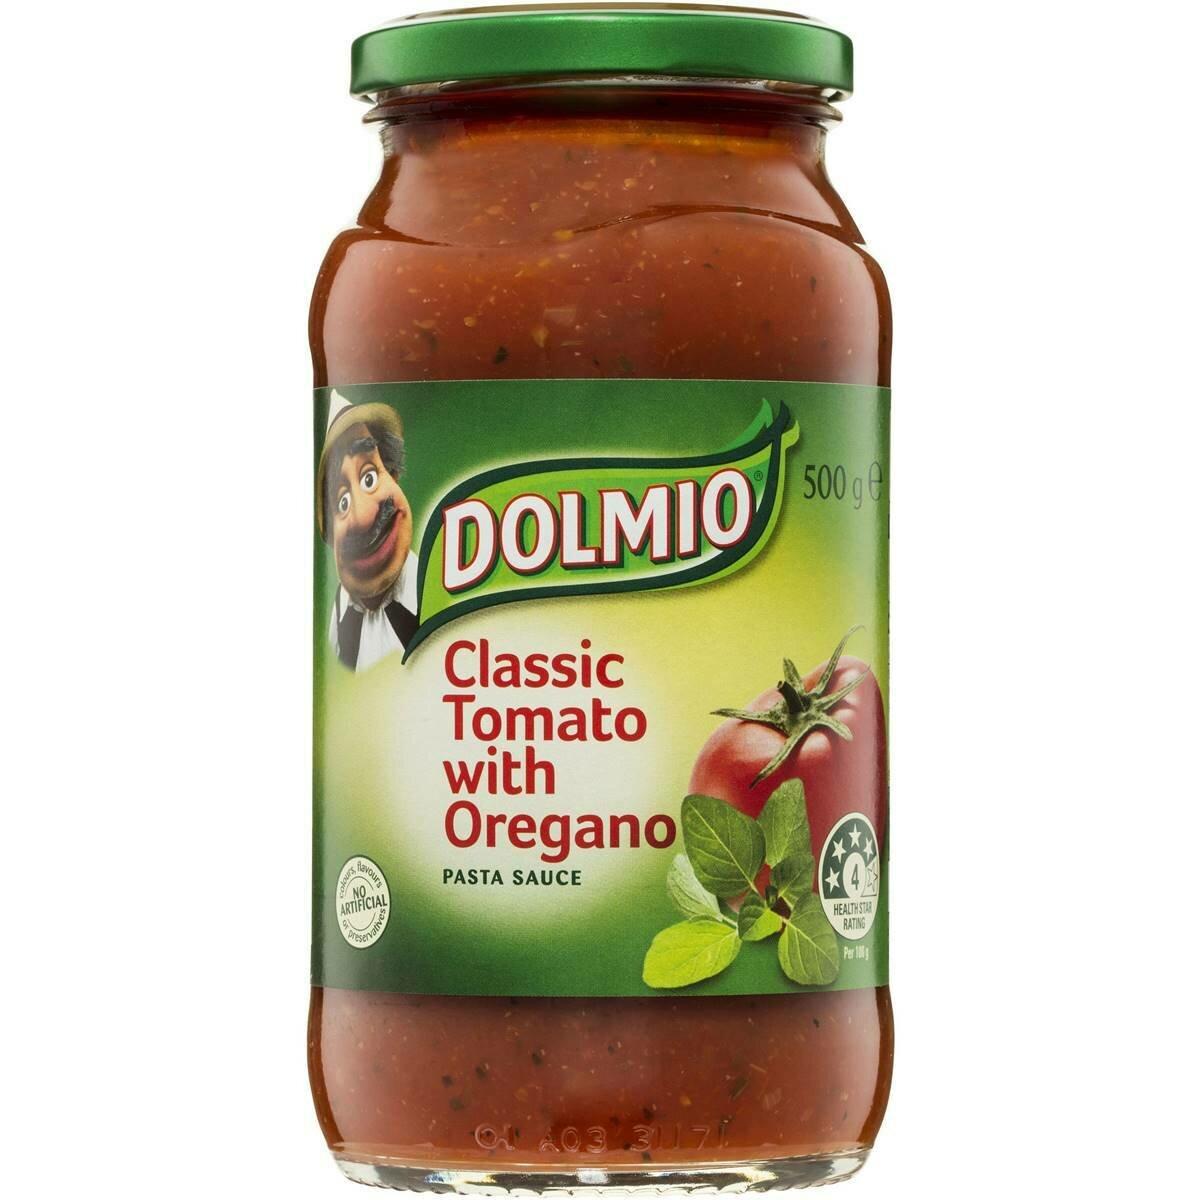 Dolmioclassic Tomato